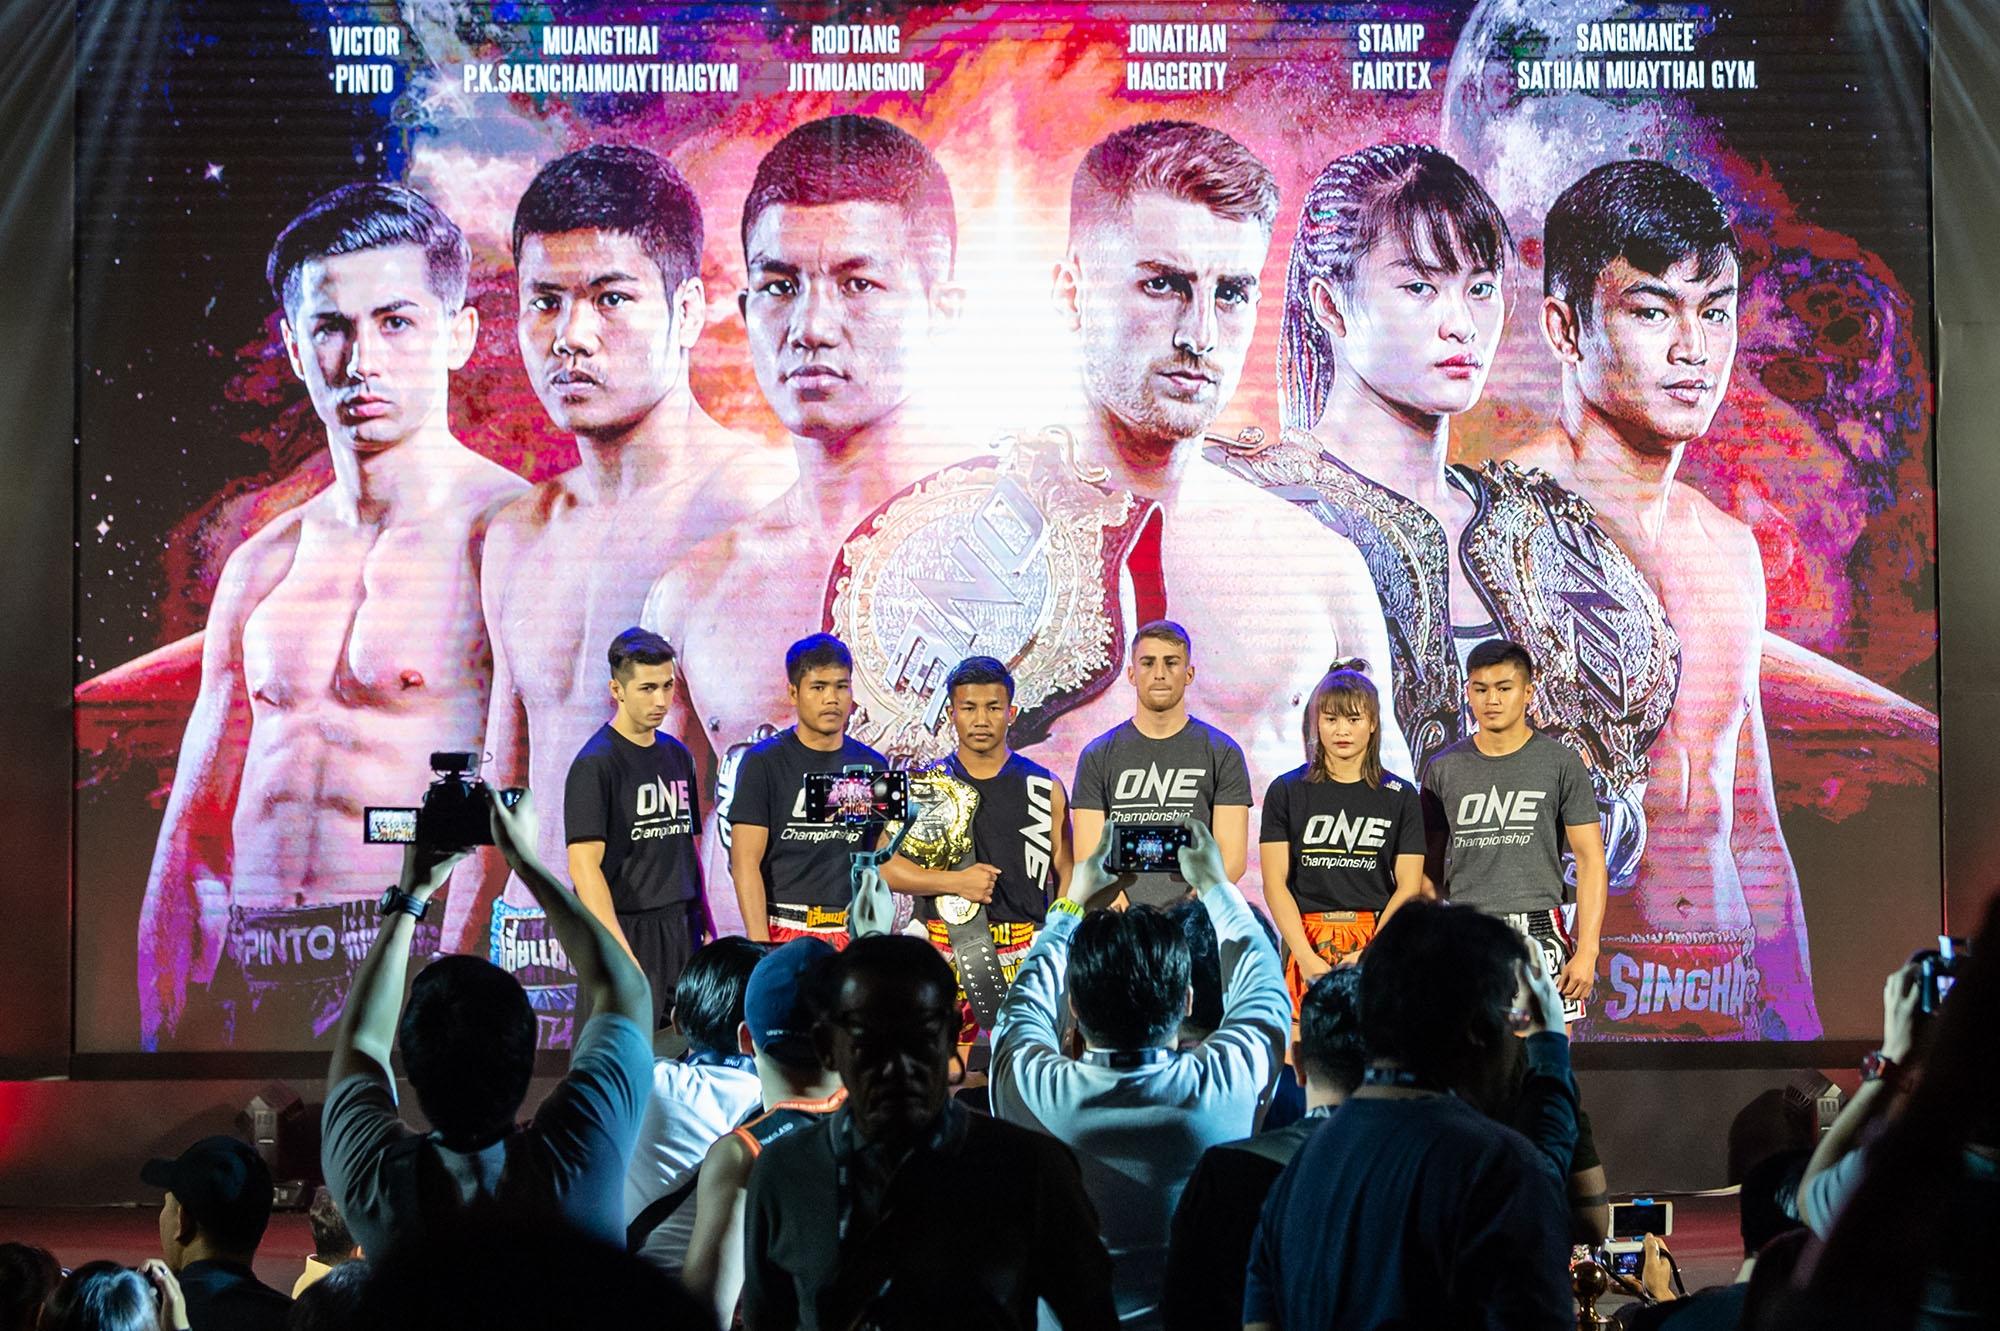 ONE จับมือ กกท. ยกระดับกีฬามวยไทยสู่เวทีโลกศึก ONE: A NEW TOMORROW รับปี 2020